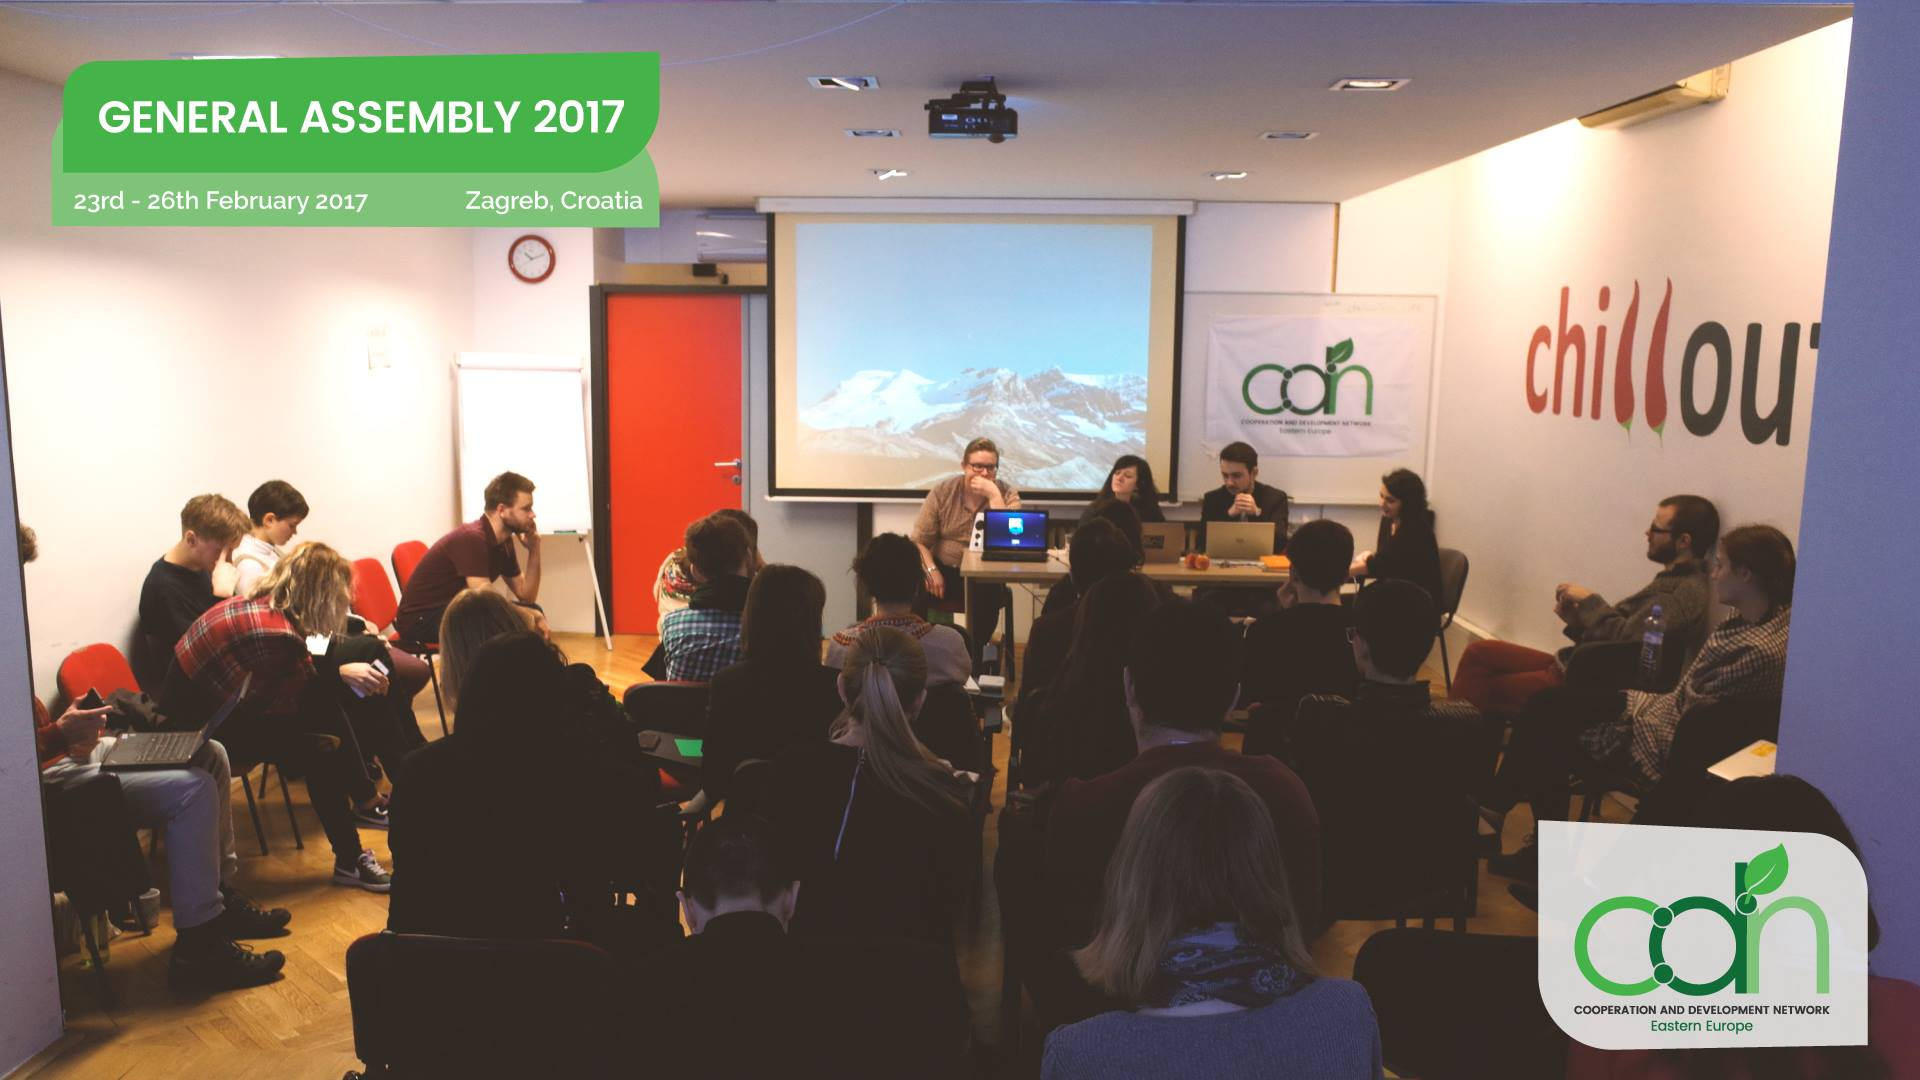 CDN_General_assembly_2017